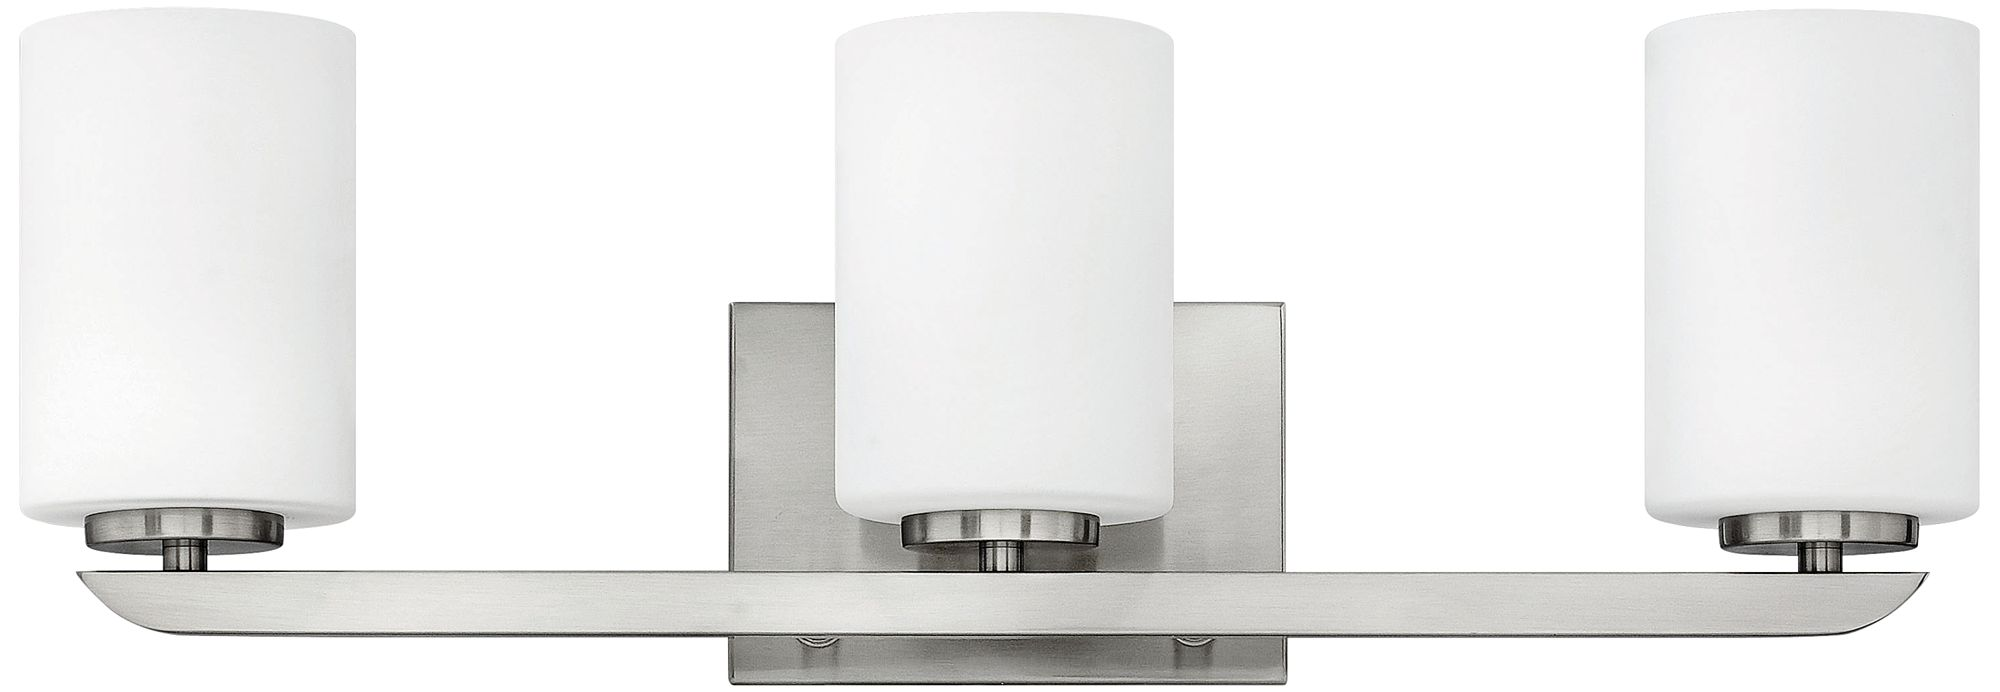 Hinkley Kyra 24  Wide Brushed Nickel 3-Light Bath Light  sc 1 st  L&s Plus & Hinkley Bathroom Lighting   Lamps Plus azcodes.com